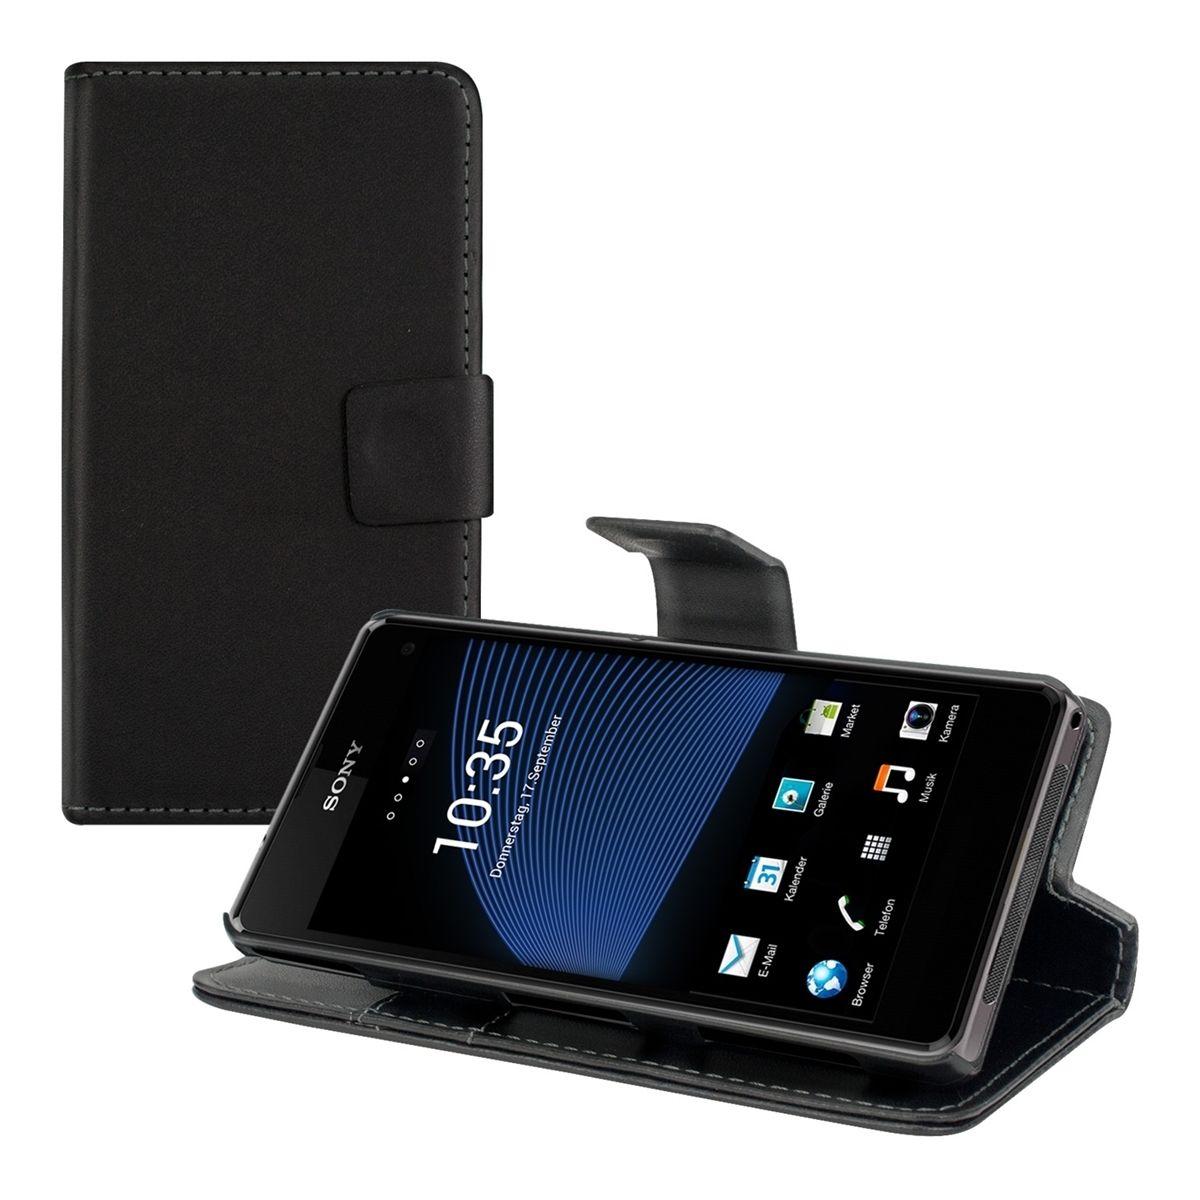 Pouzdro pro Sony Xperia Z1 Compact černé